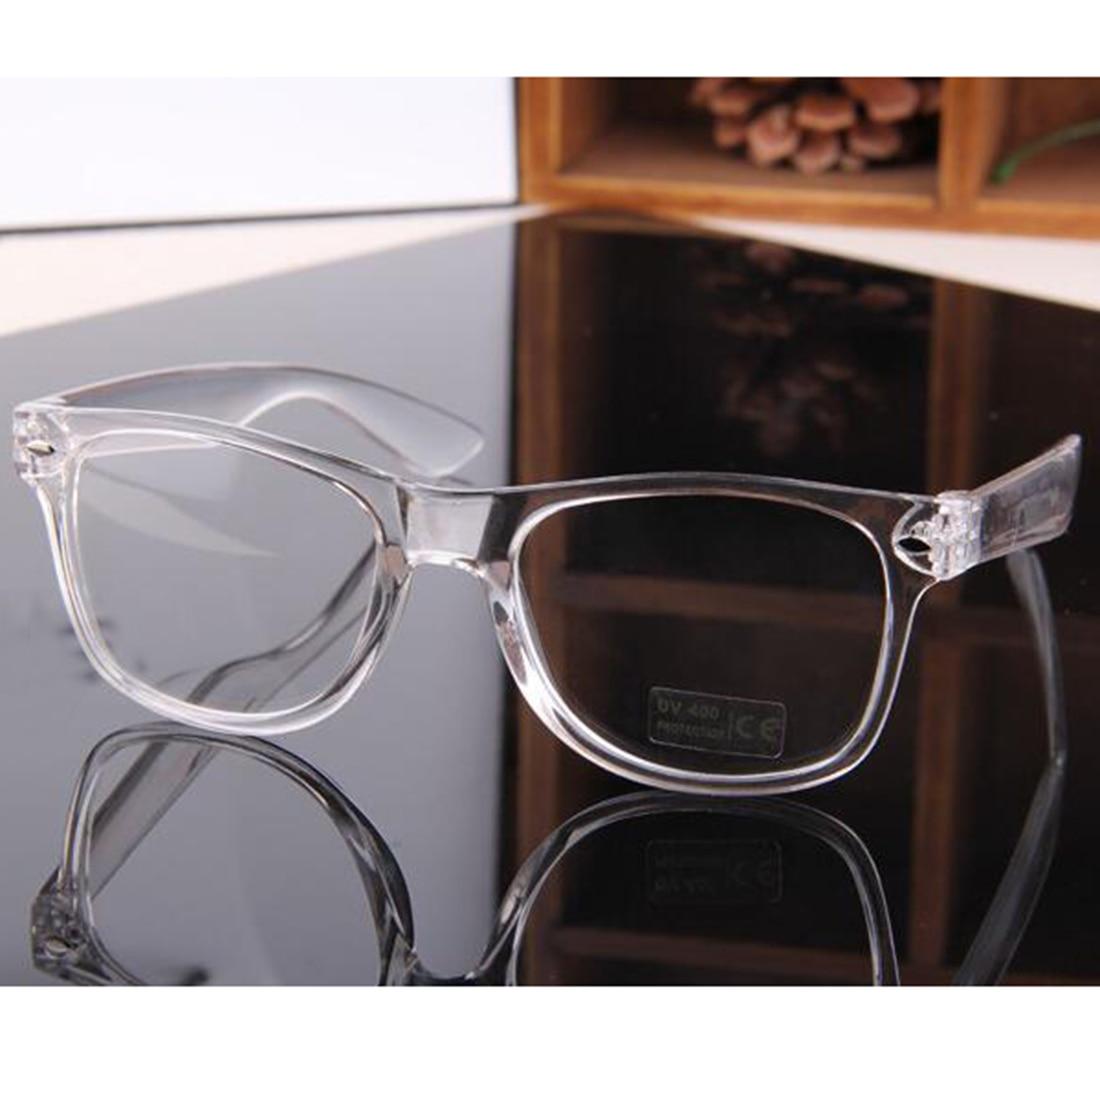 Glasses Frame Fashion 2016 : 2016 Plain Rivet Glasses Transparent Frame General Fashion ...